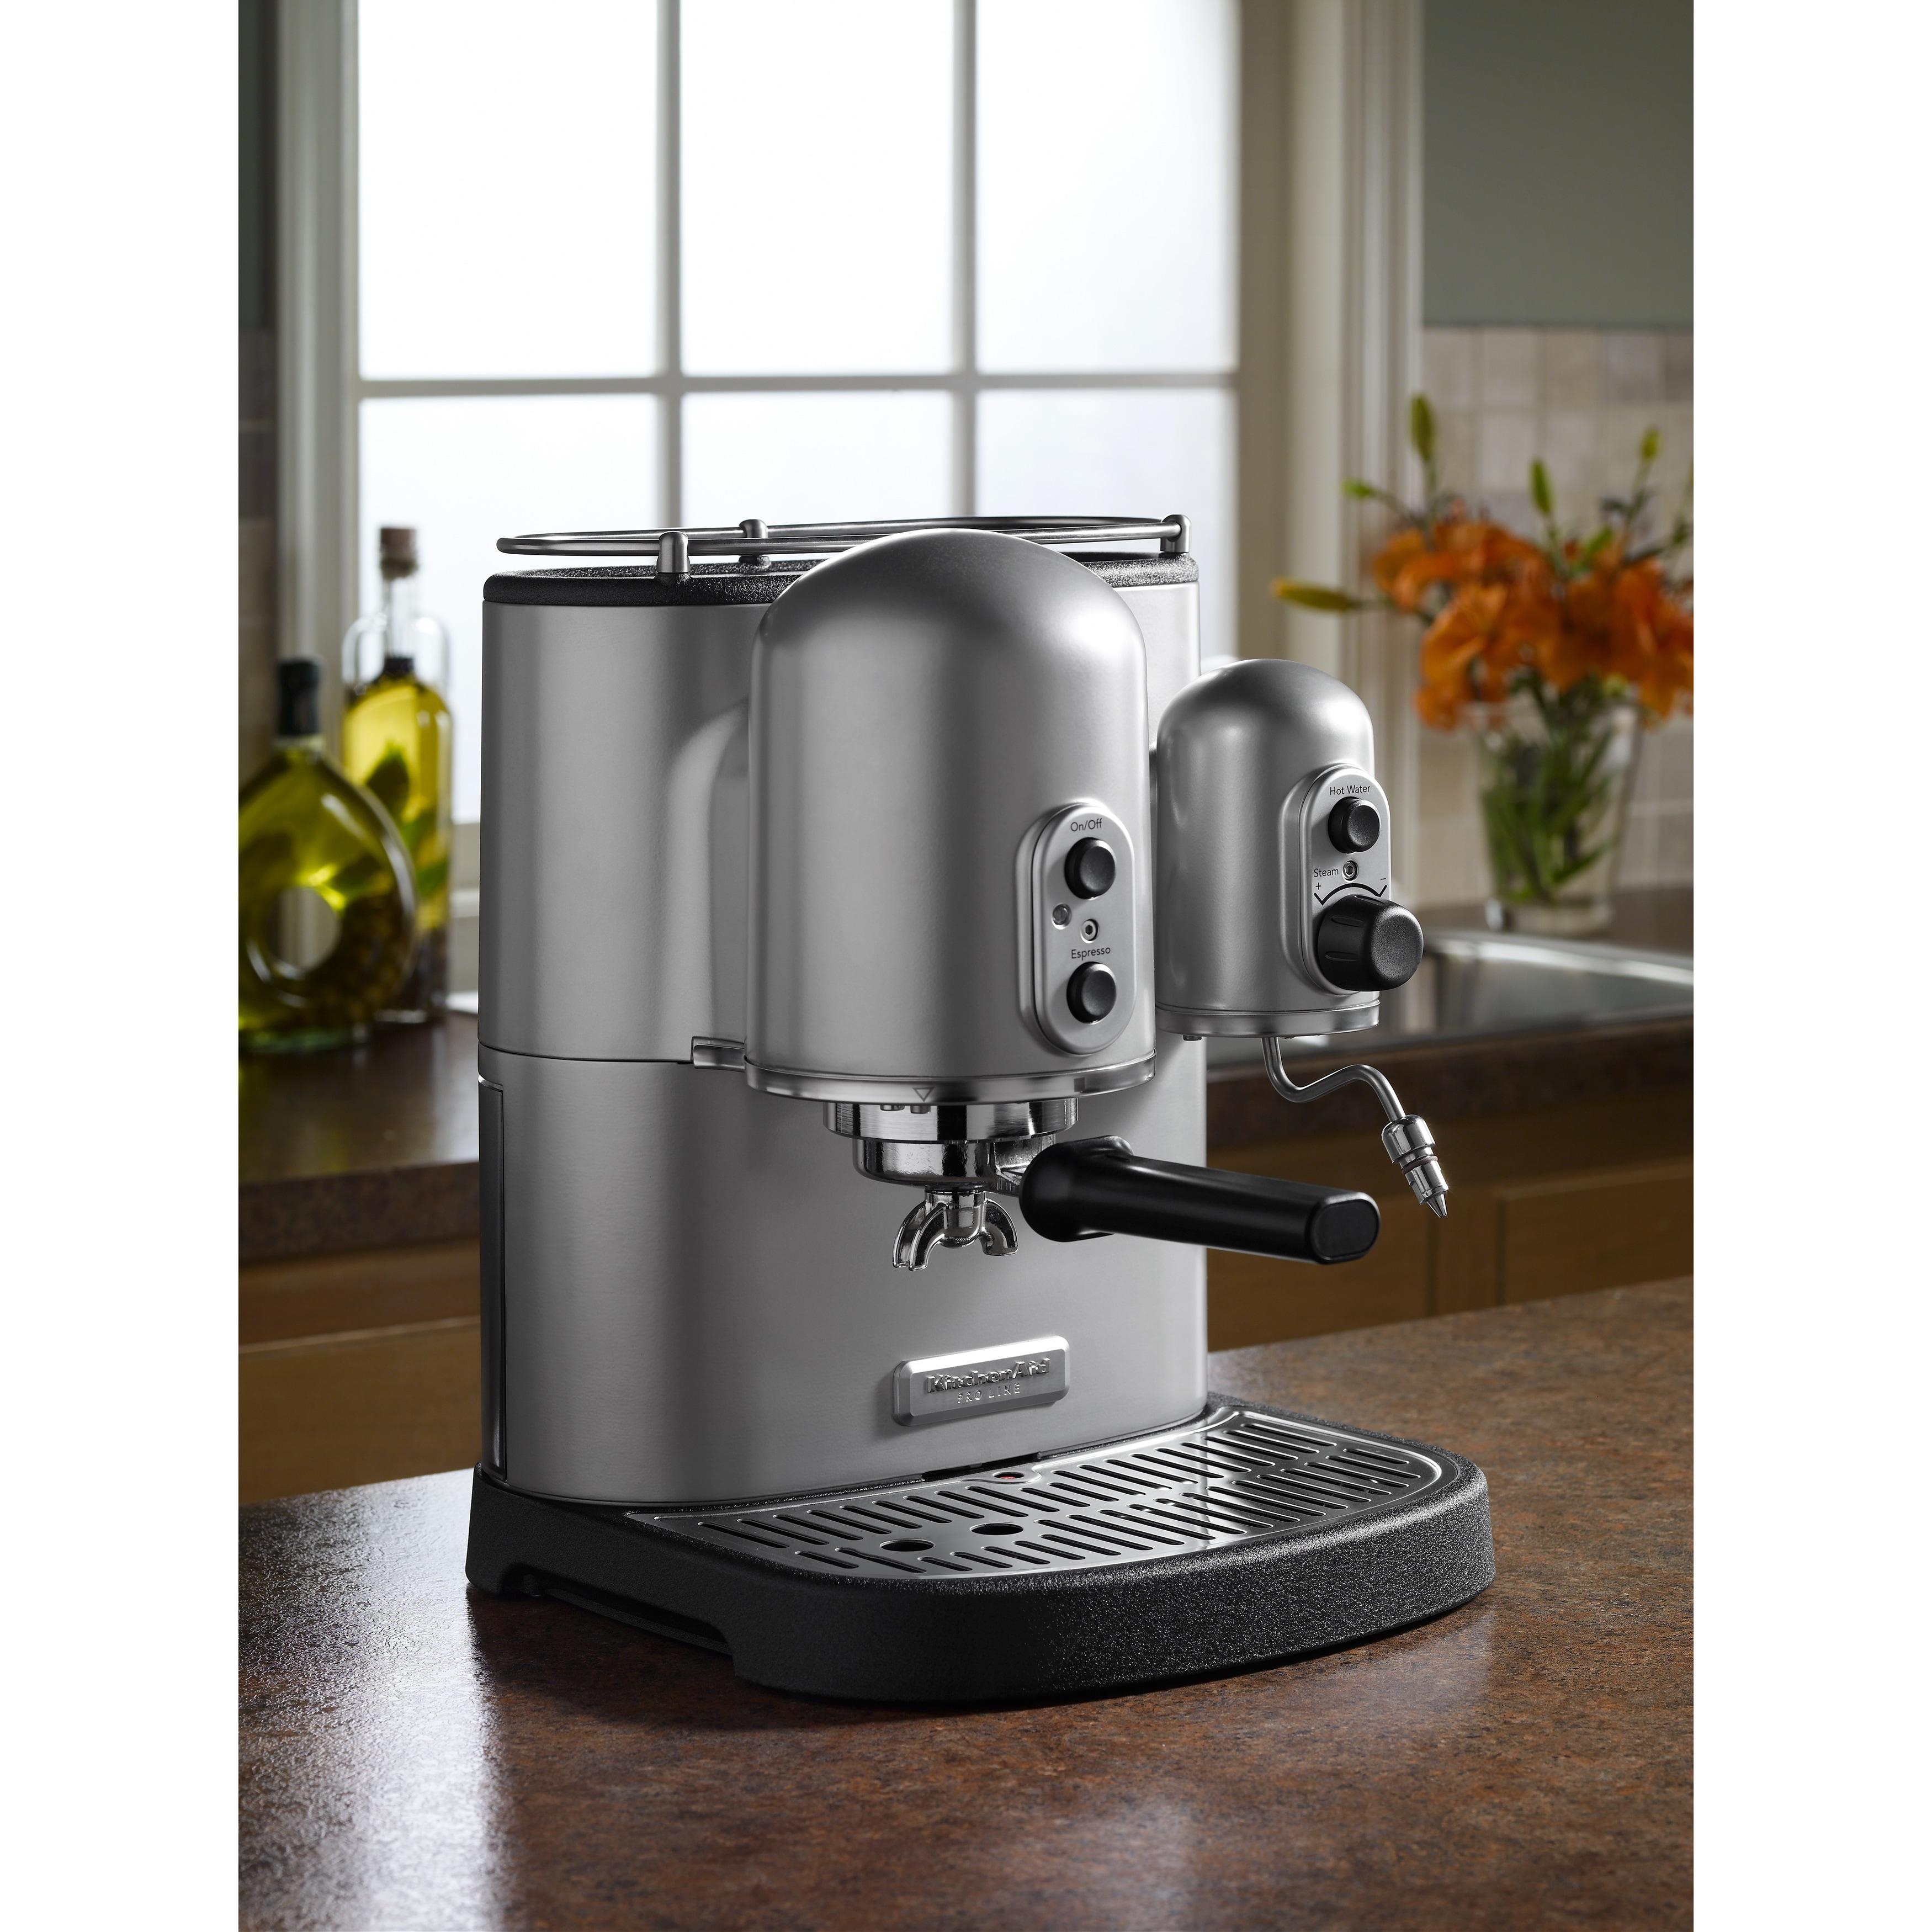 Kitchenaid Pro Line Espresso Machine Reviews Kitchen Appliances